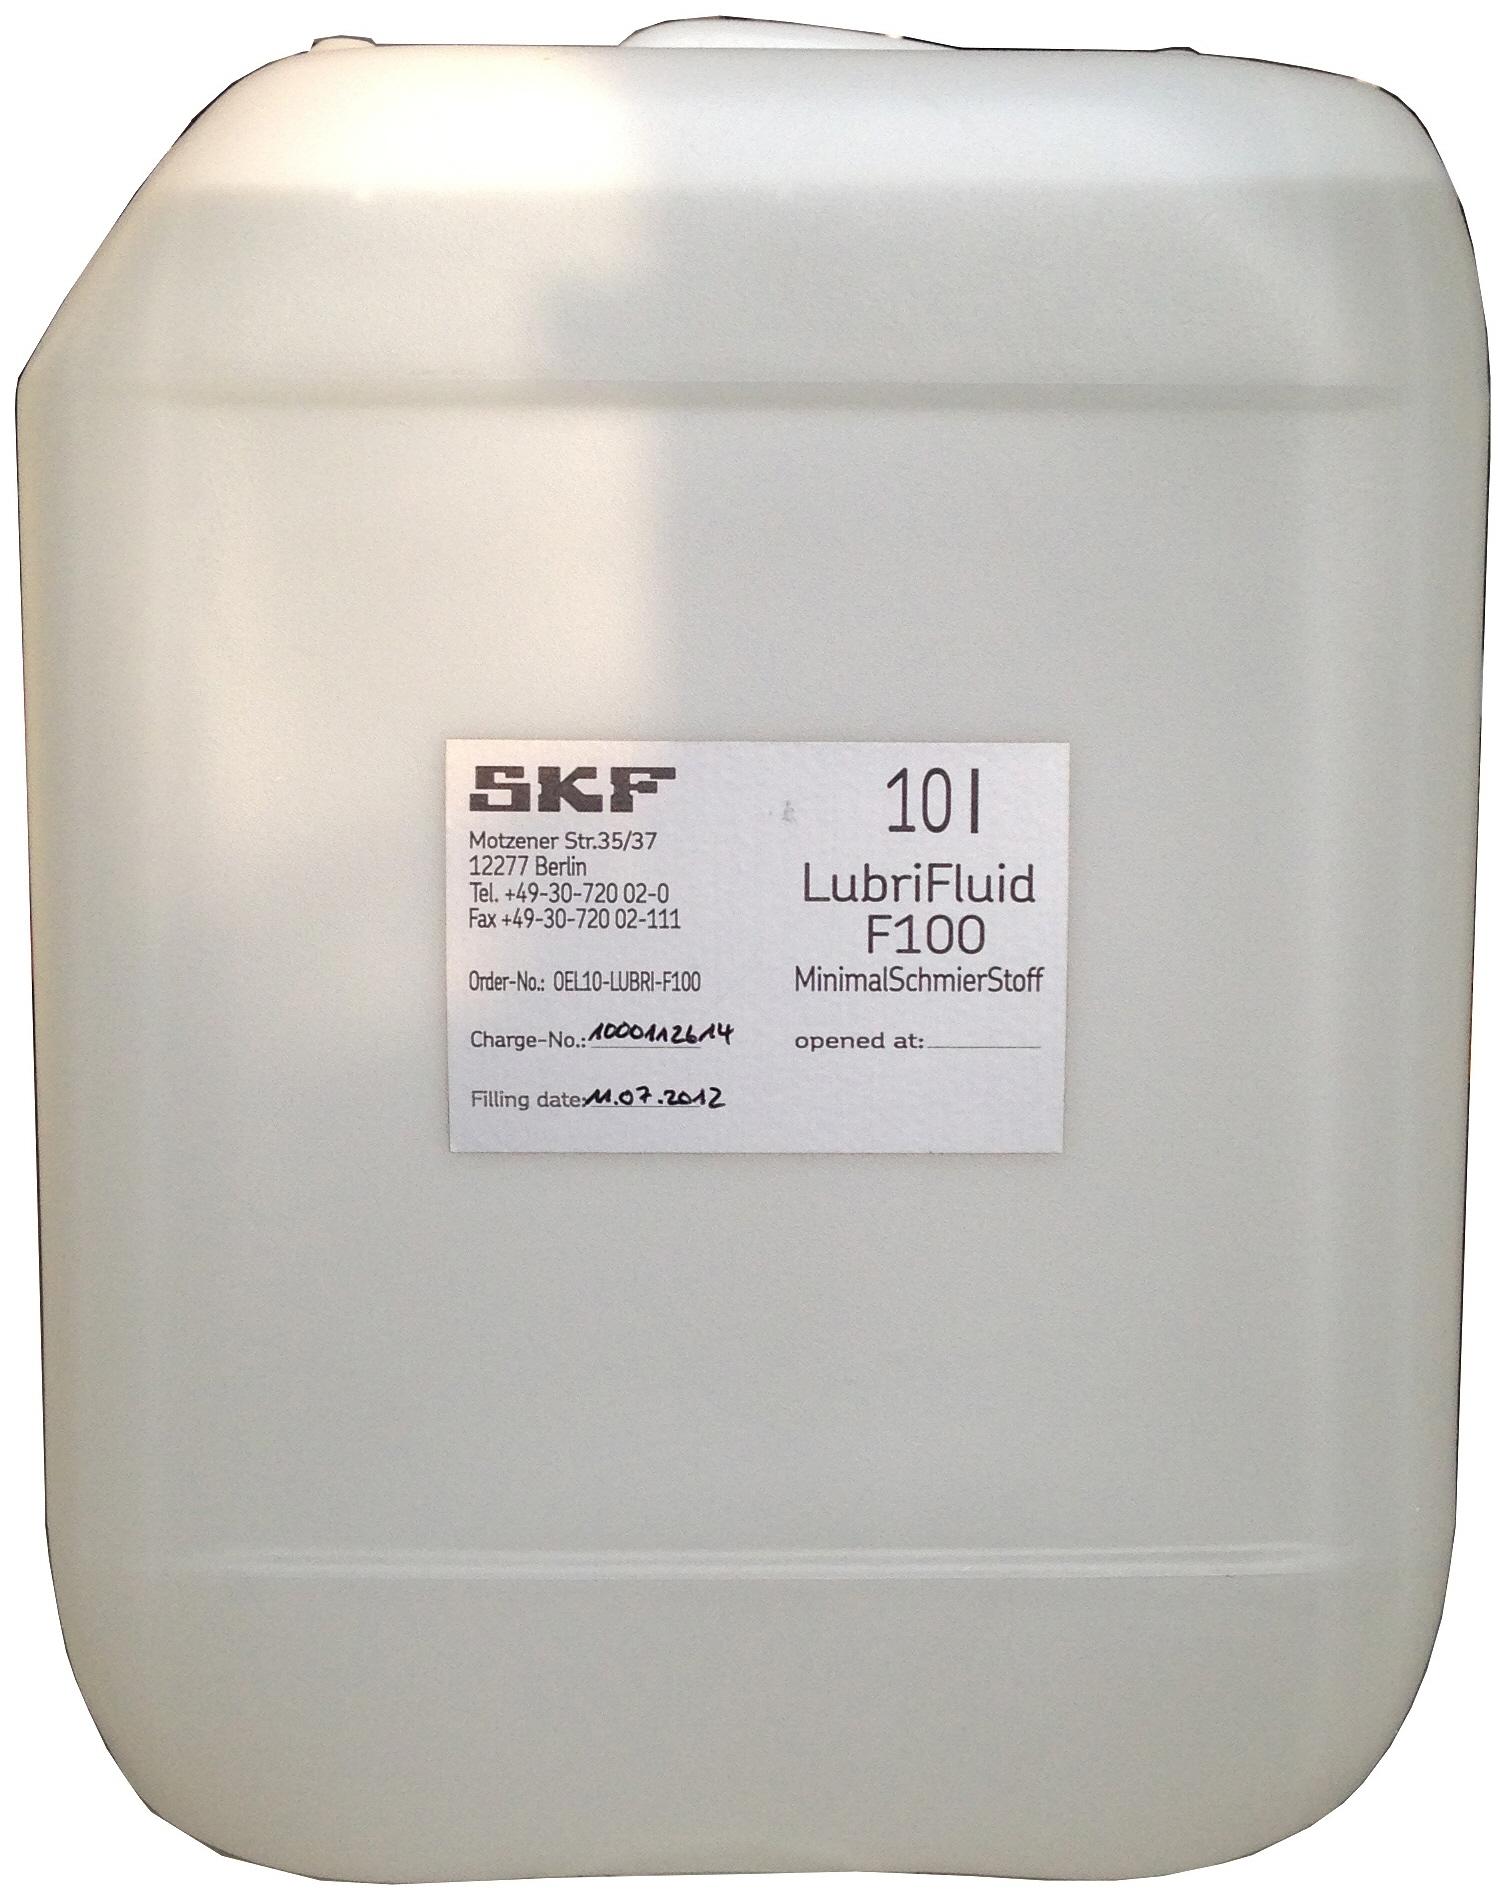 LubriFluid F100.JPG